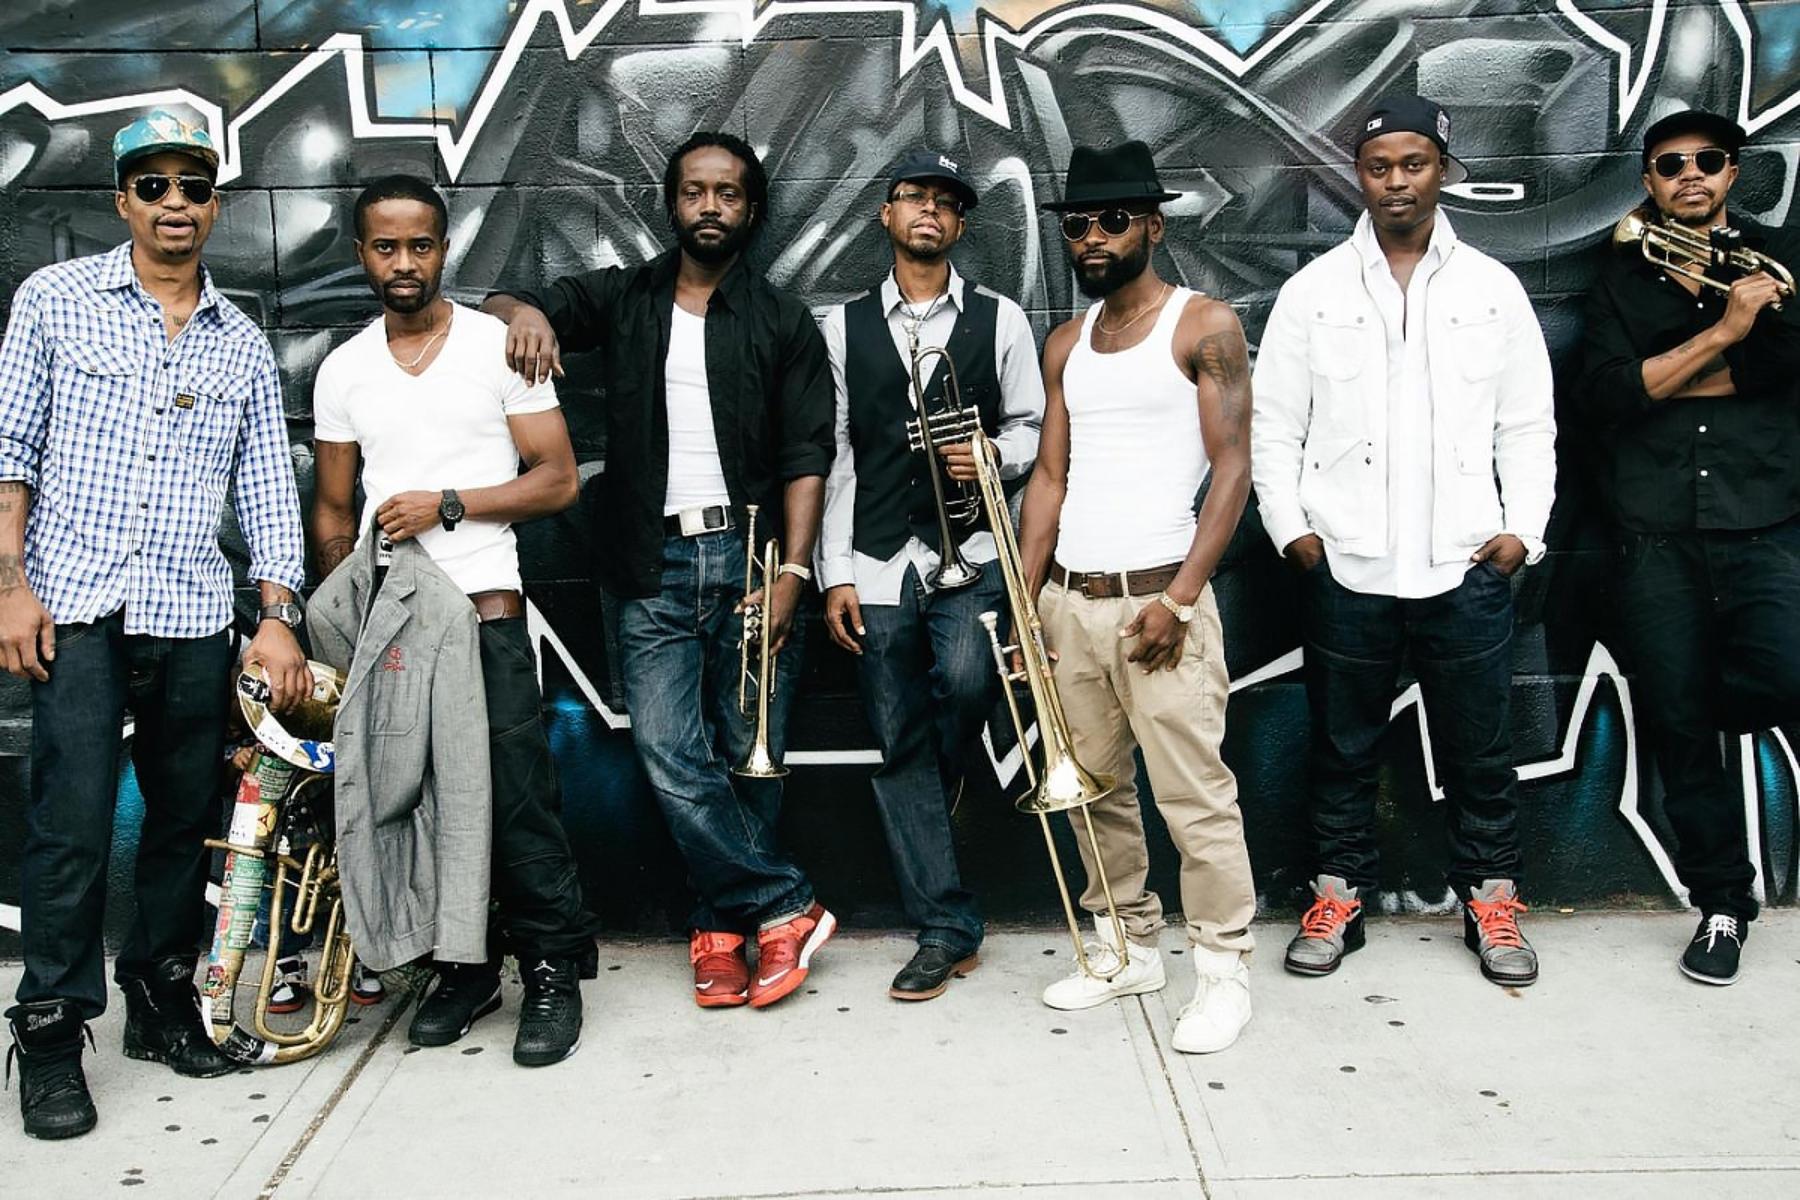 Hypnotic Brass Ensemble, photo source: Atlantic